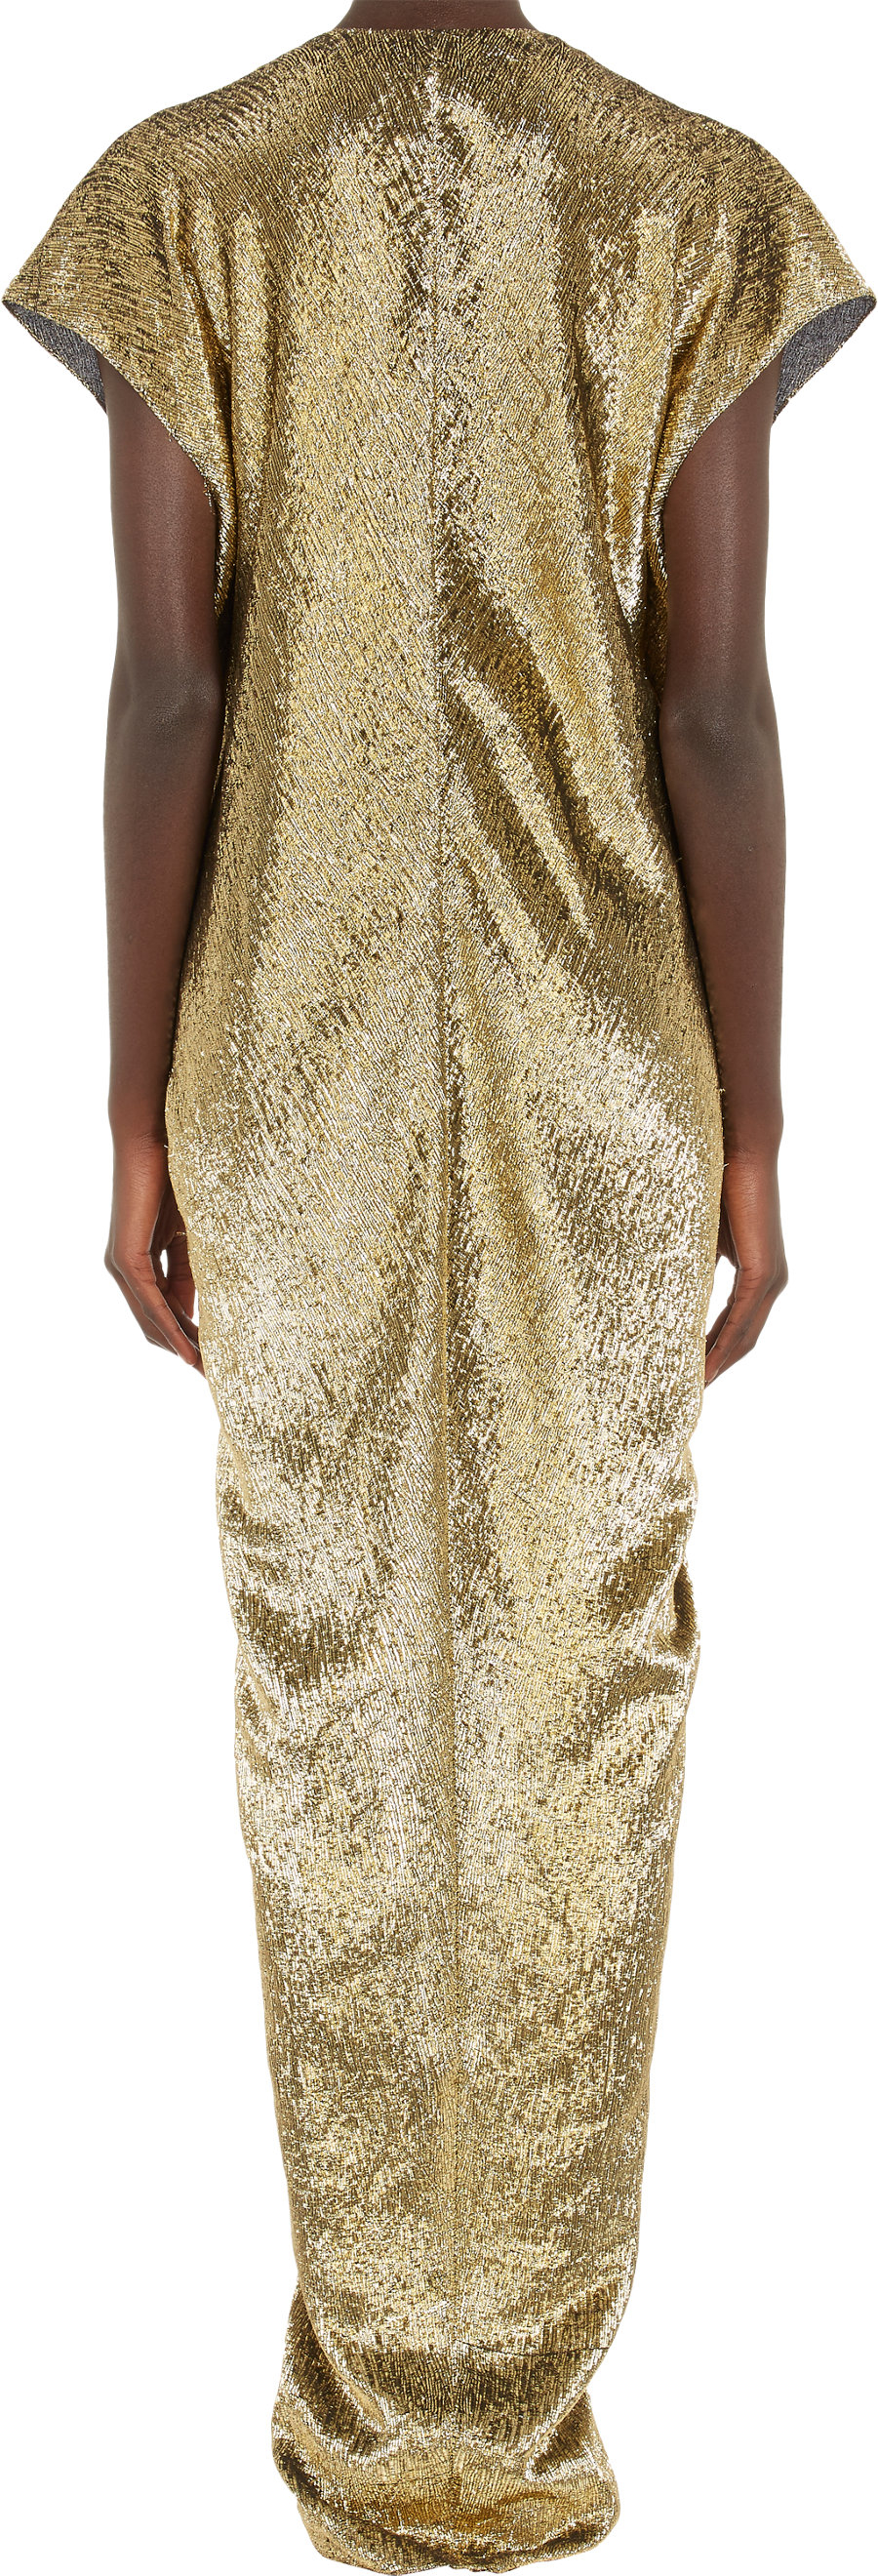 Lanvin Metallic Leopard Jacquard Belted Dress In Gold